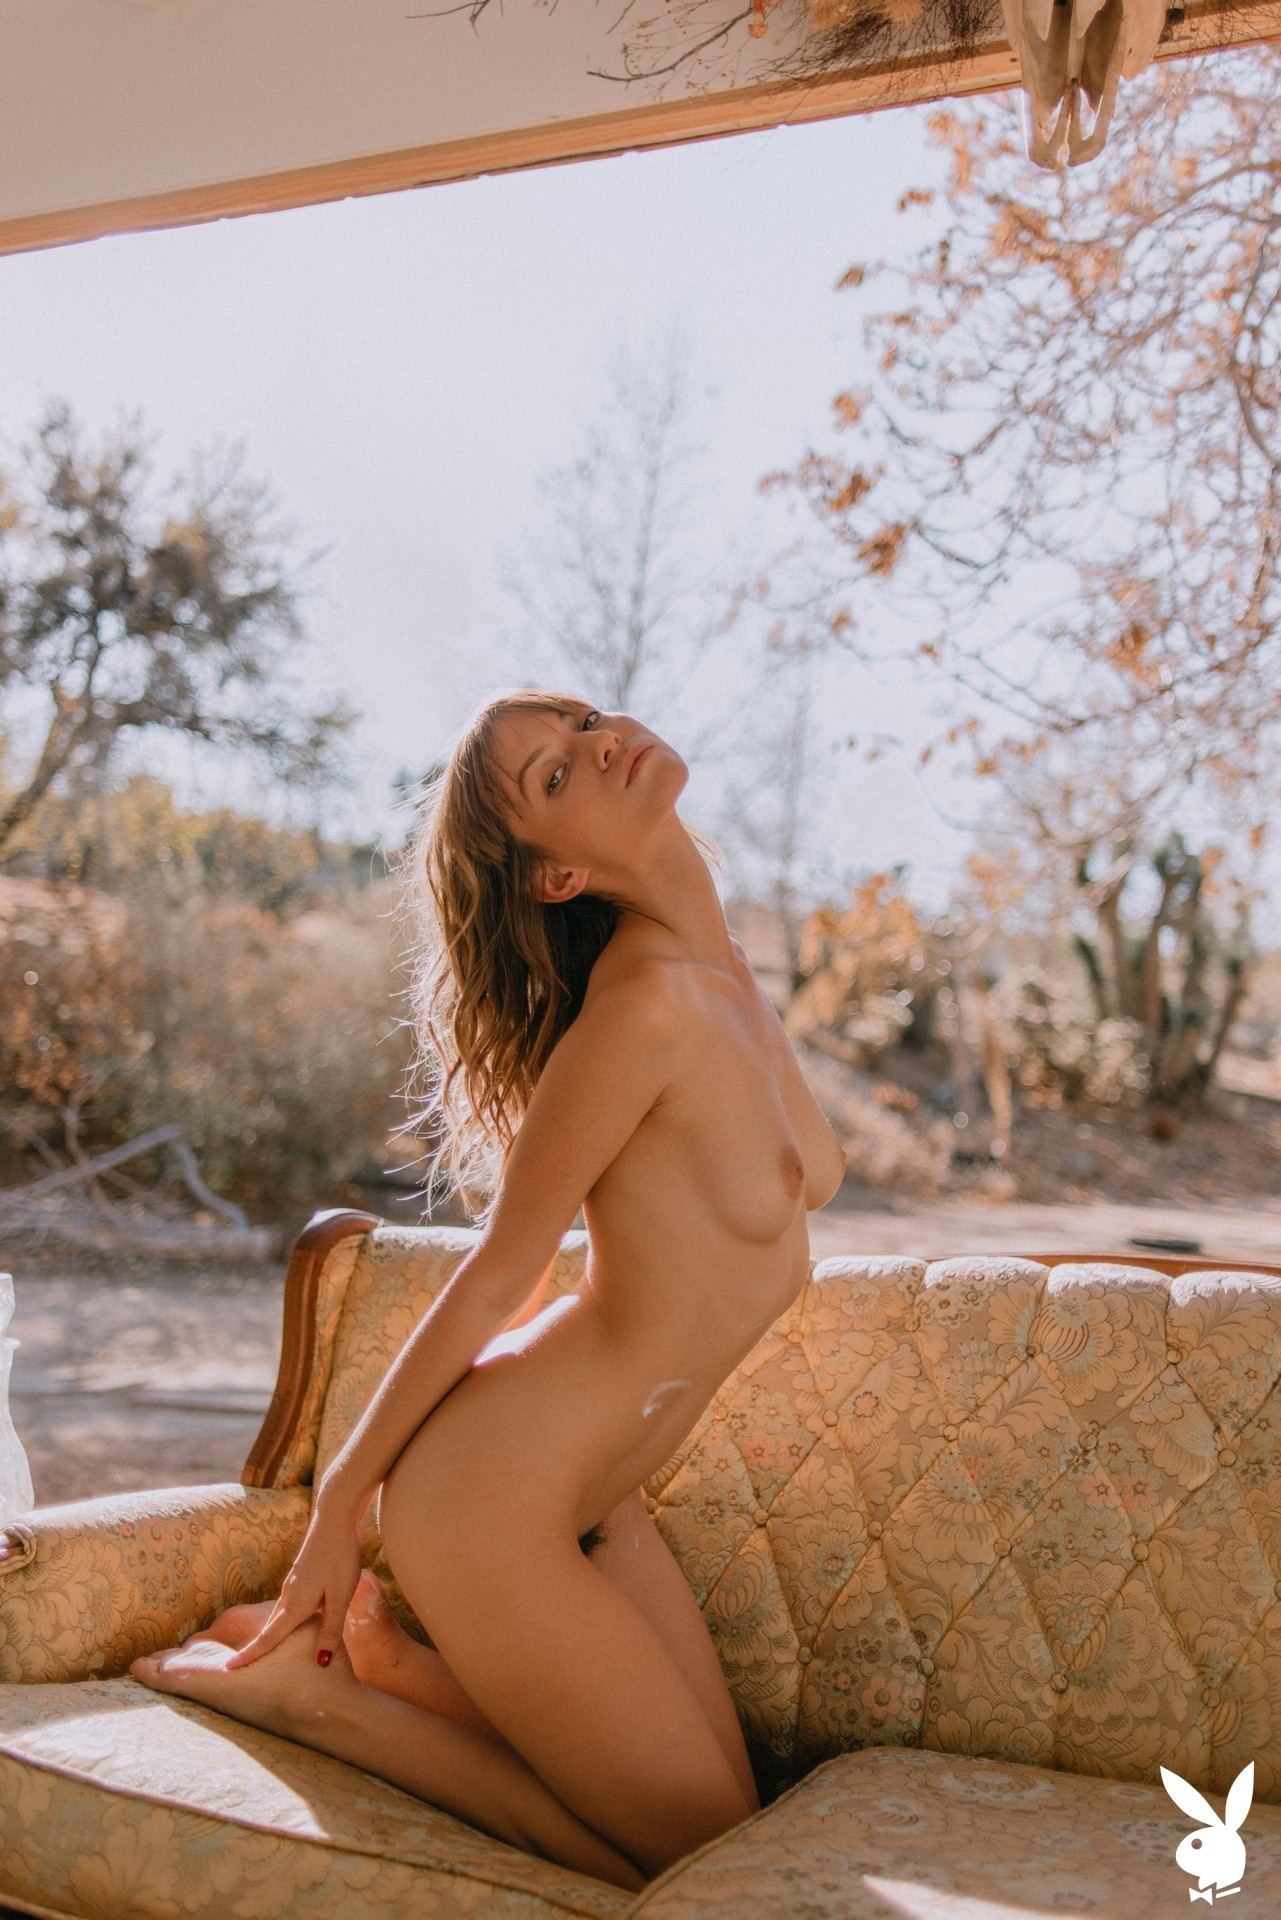 Nastasia Celeste In Creative Space Playboy Plus (25)